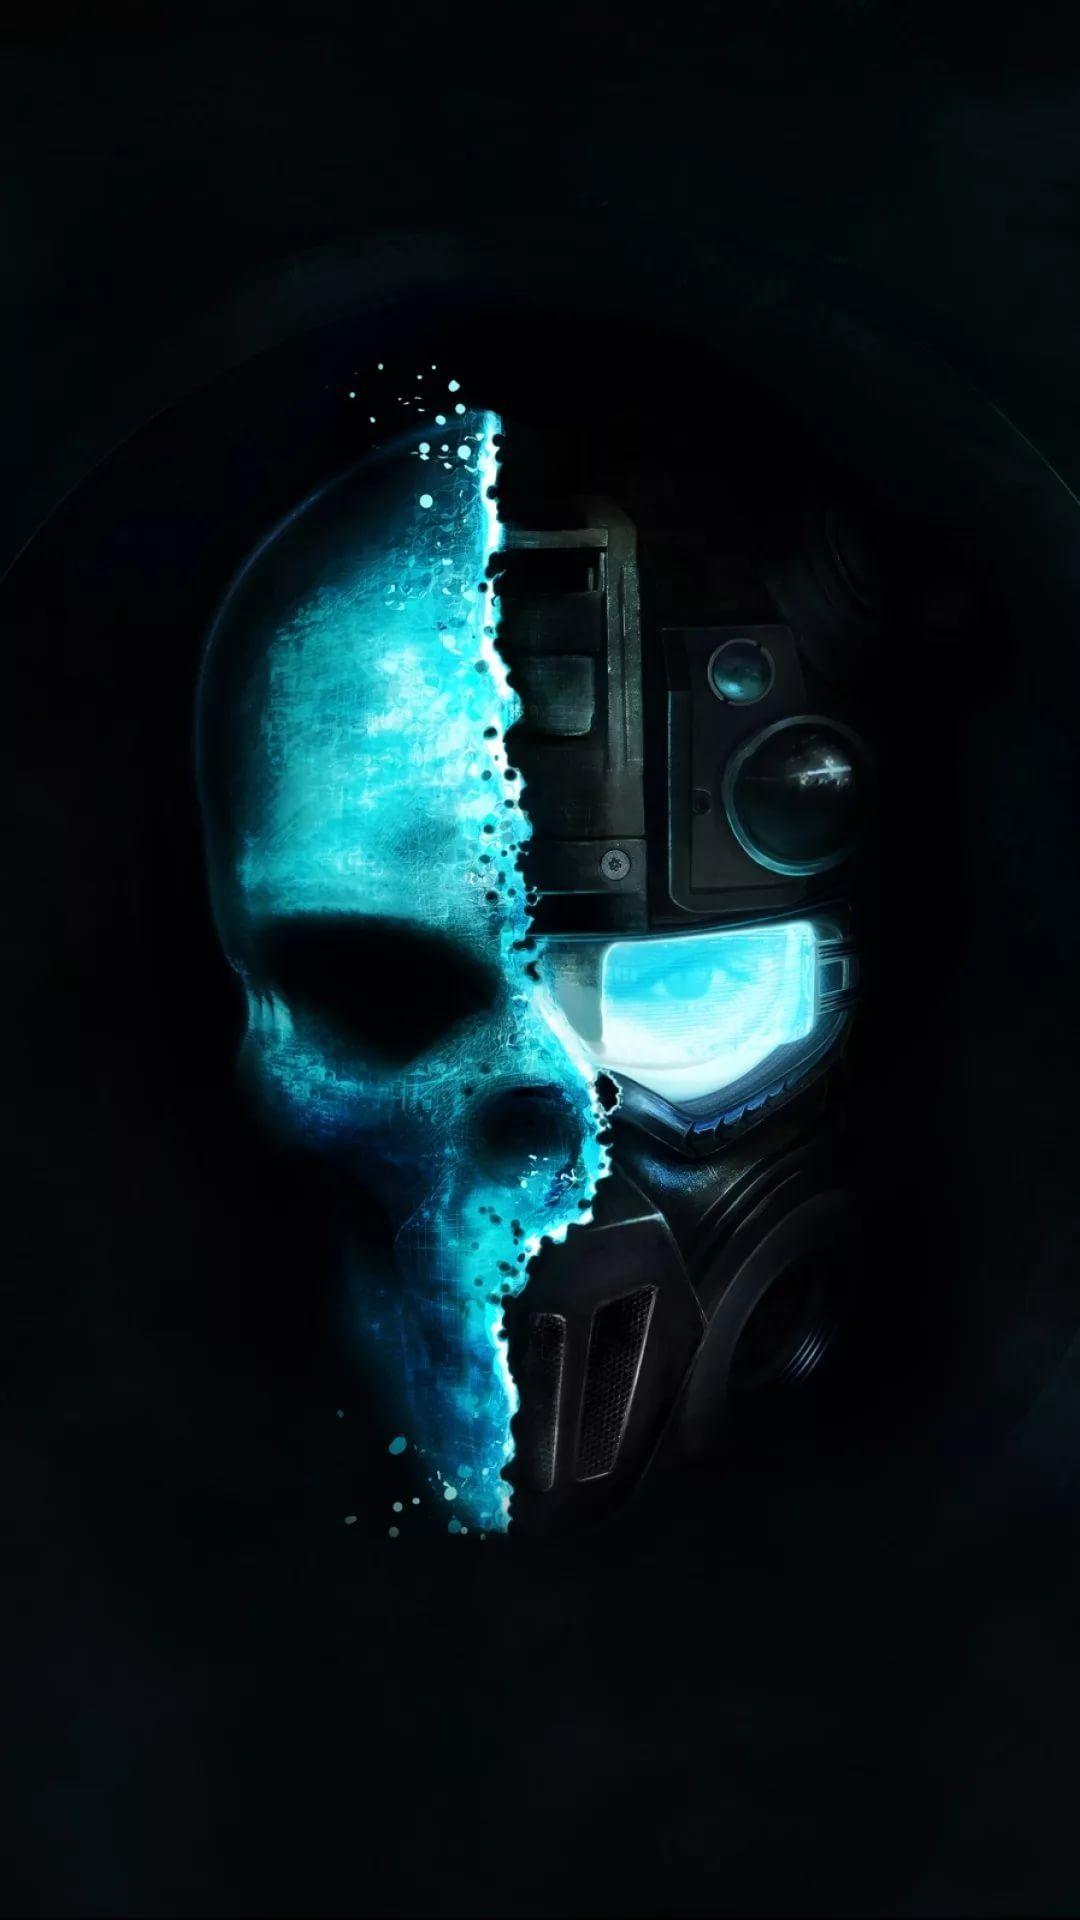 Cool Skull iPhone 5s wallpaper